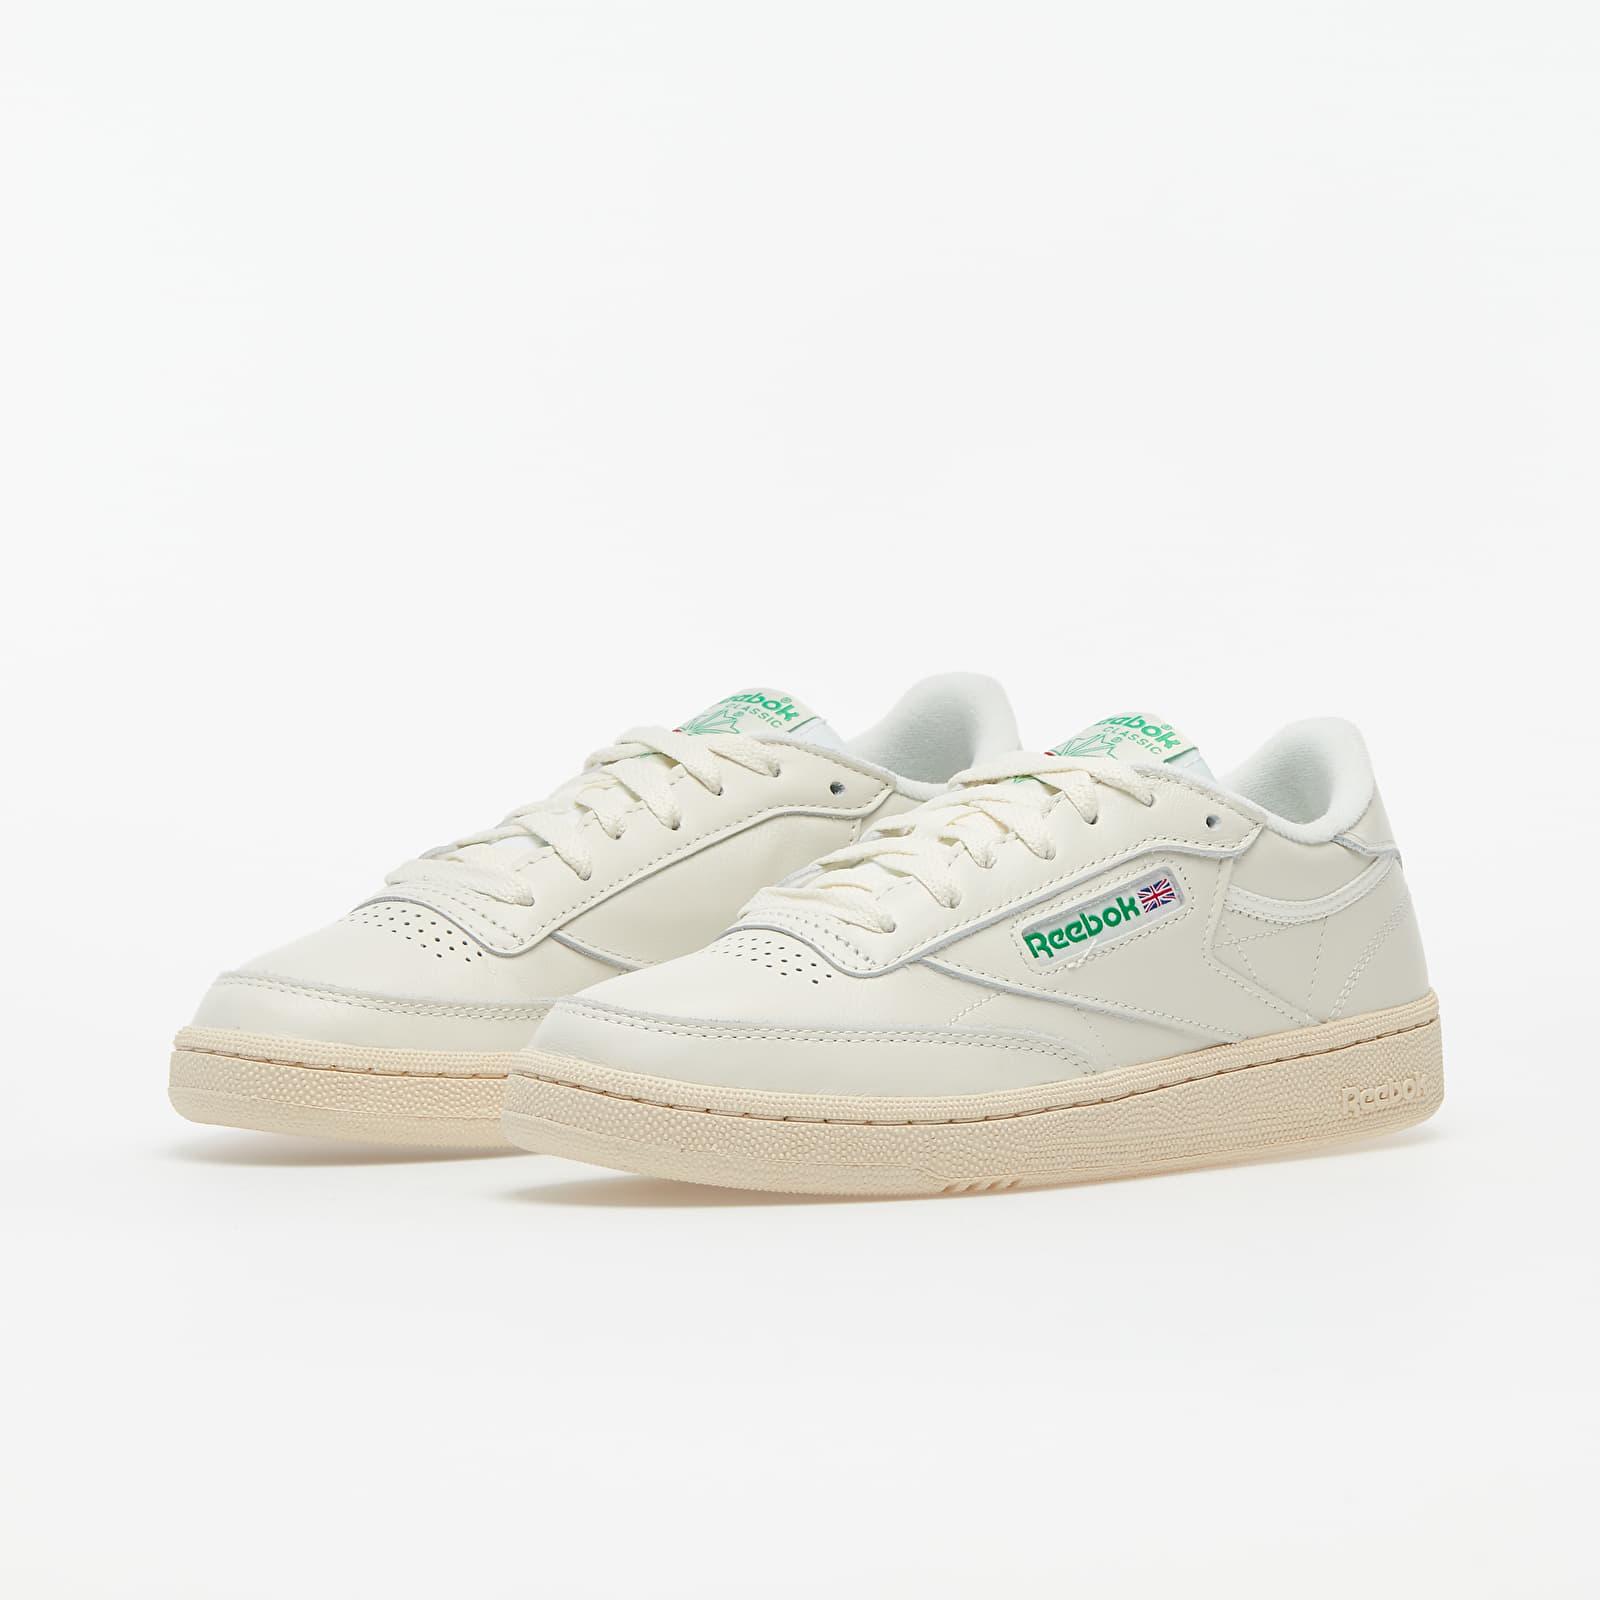 shoes Reebok Club C 85 Chalk/ Green